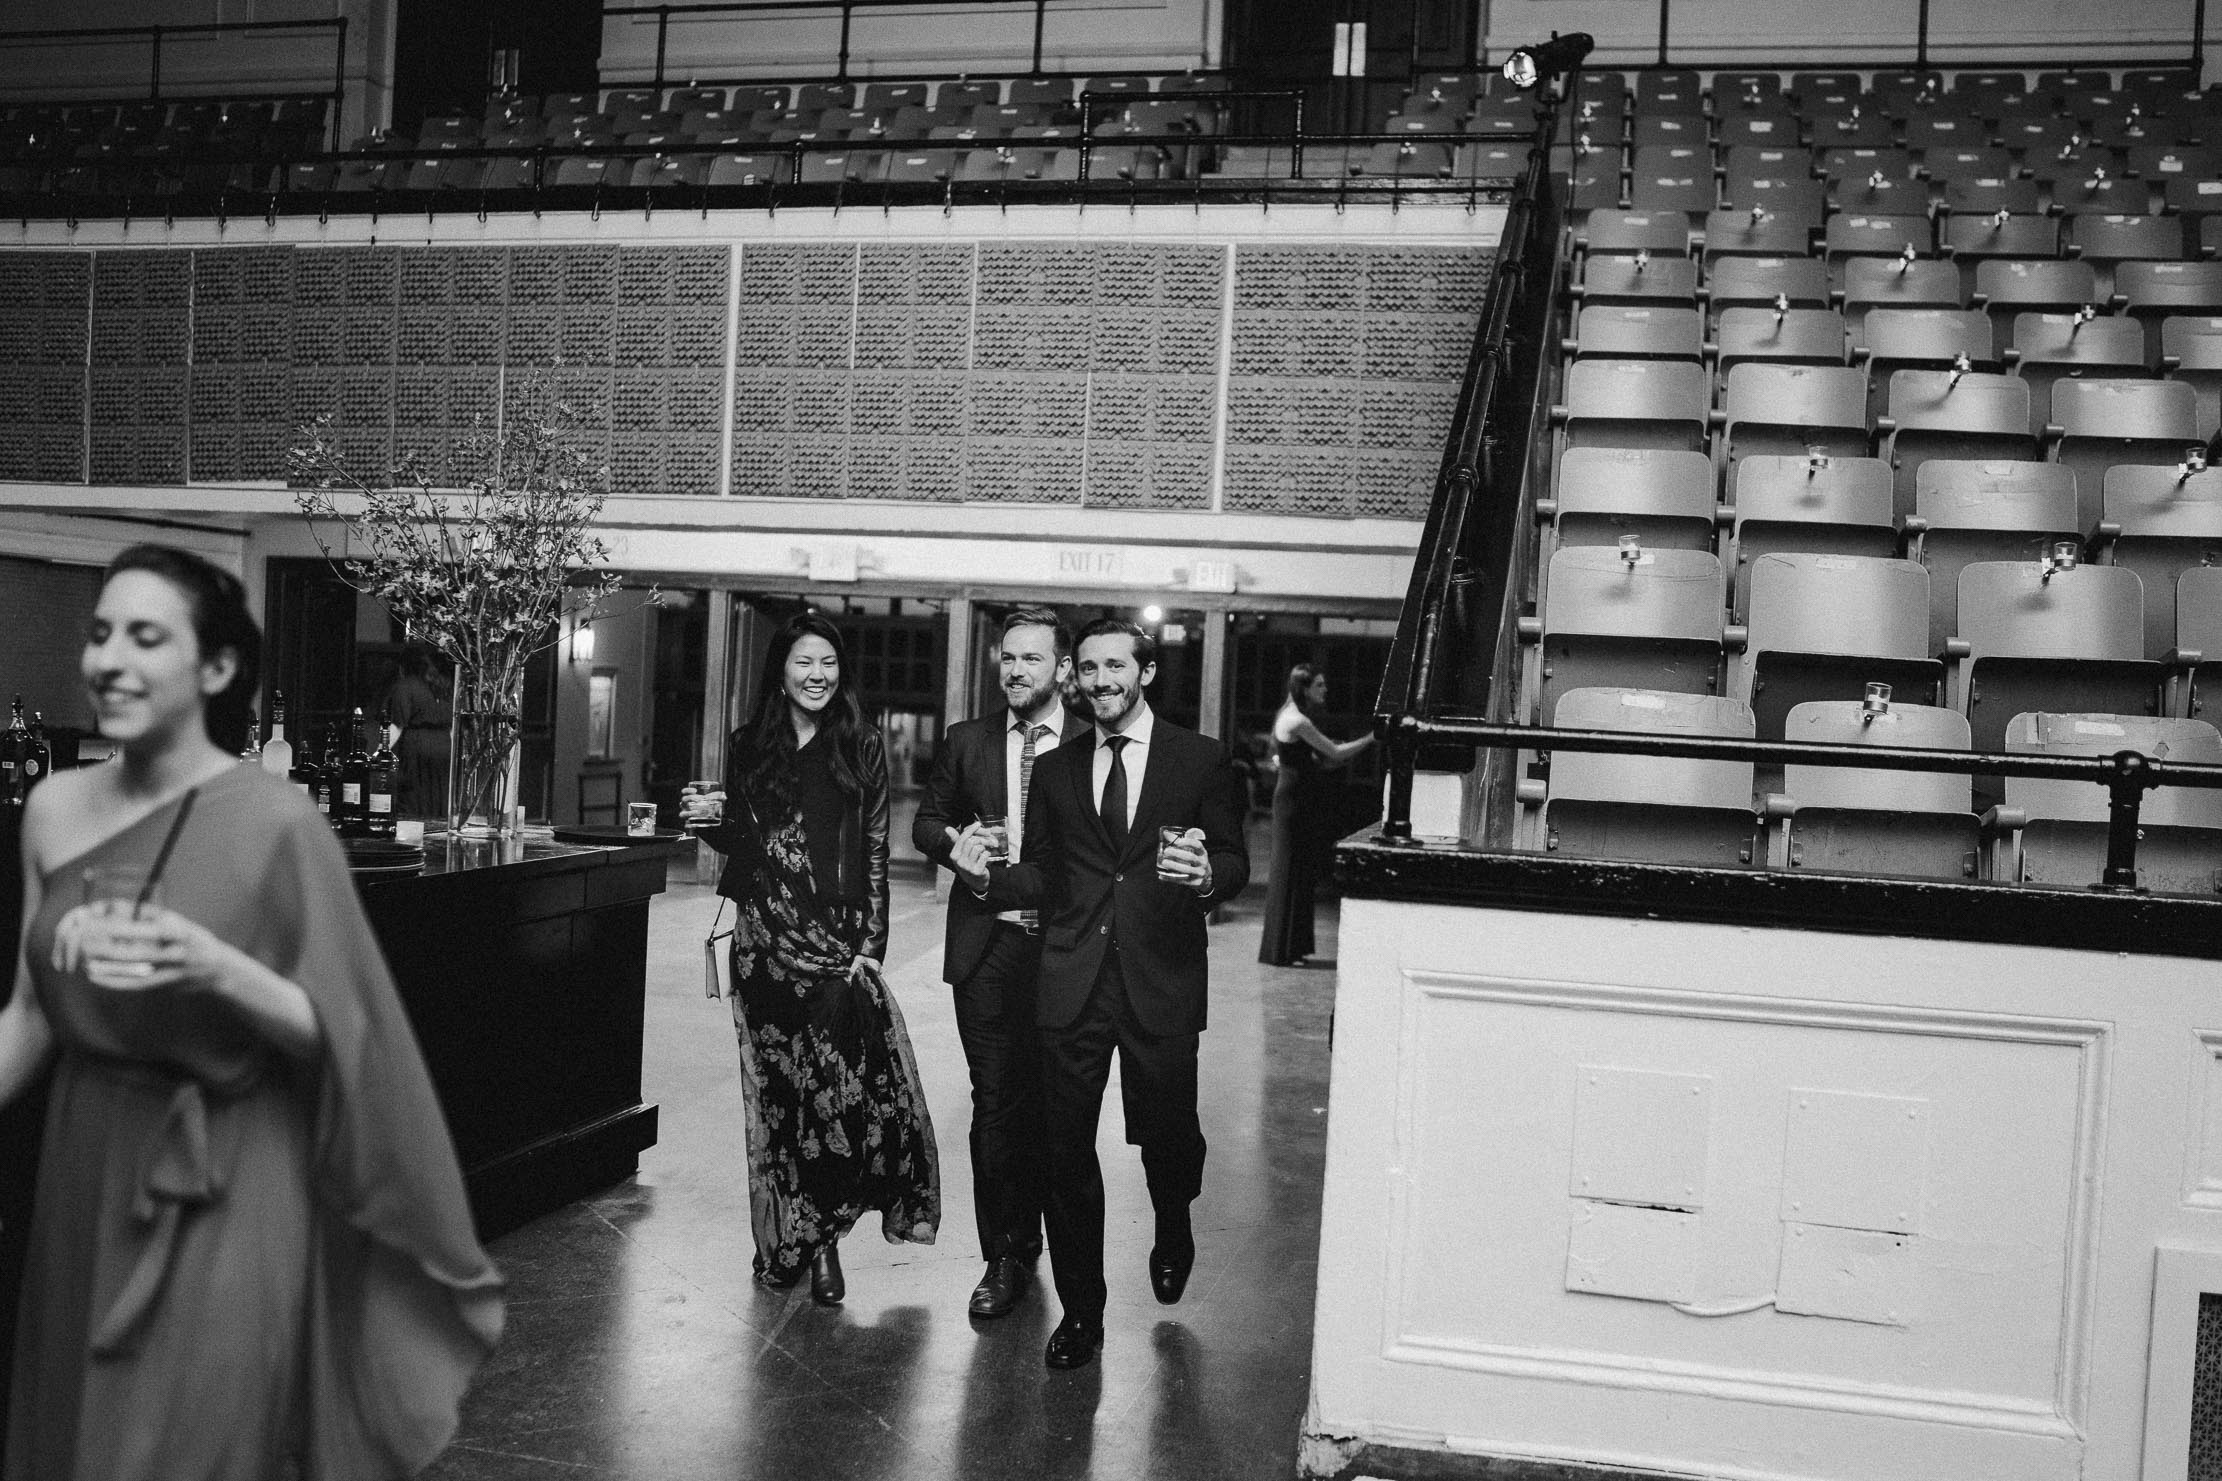 Asbury-Park-Convention-Hall-Wedding-2093.jpg